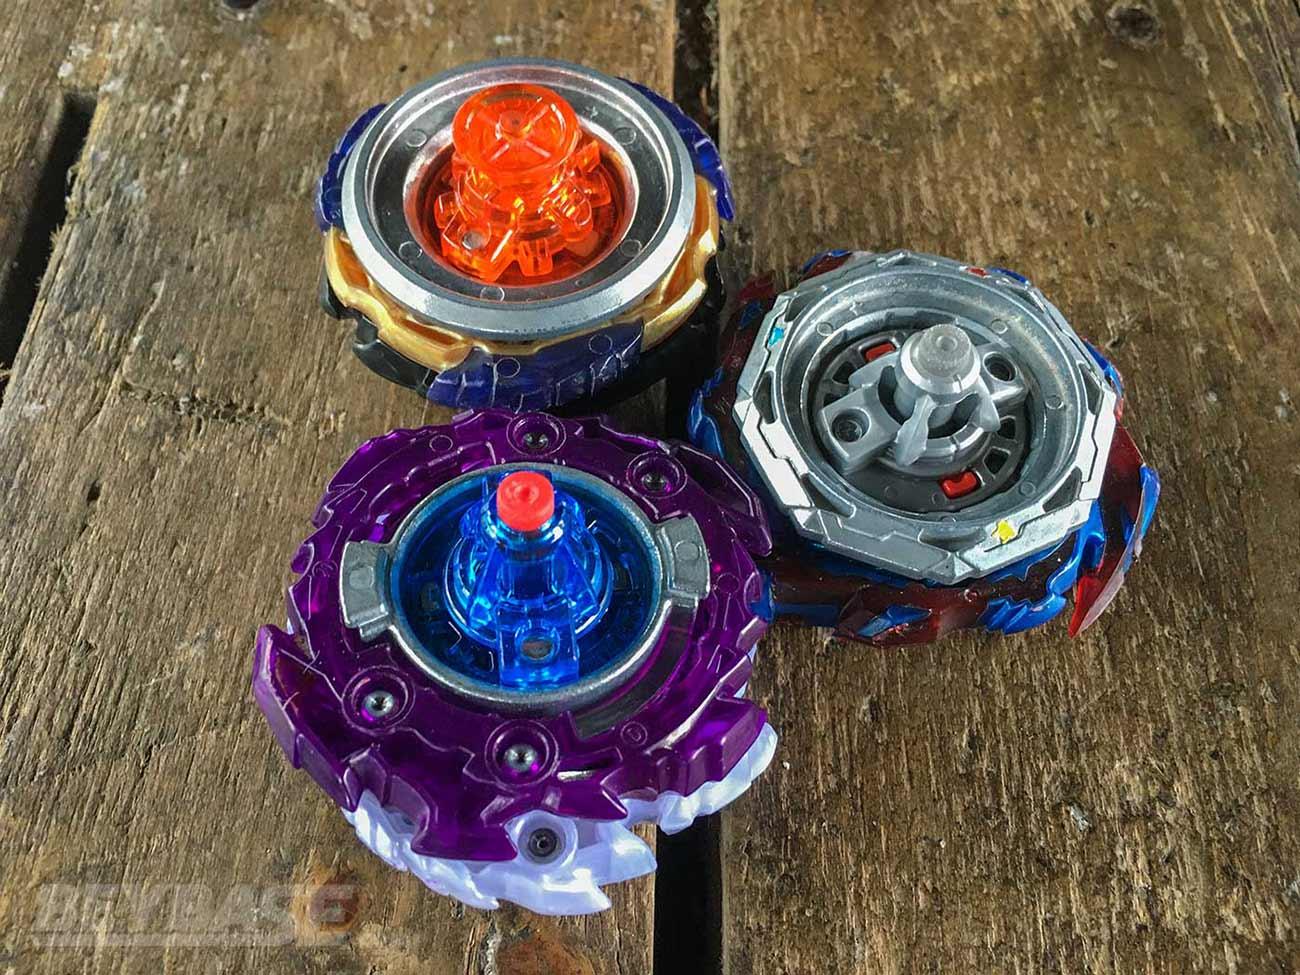 beyblade burst deck: rage metal xtreme 3a, savior giga xtreme dash, and dynamite f gear over rise